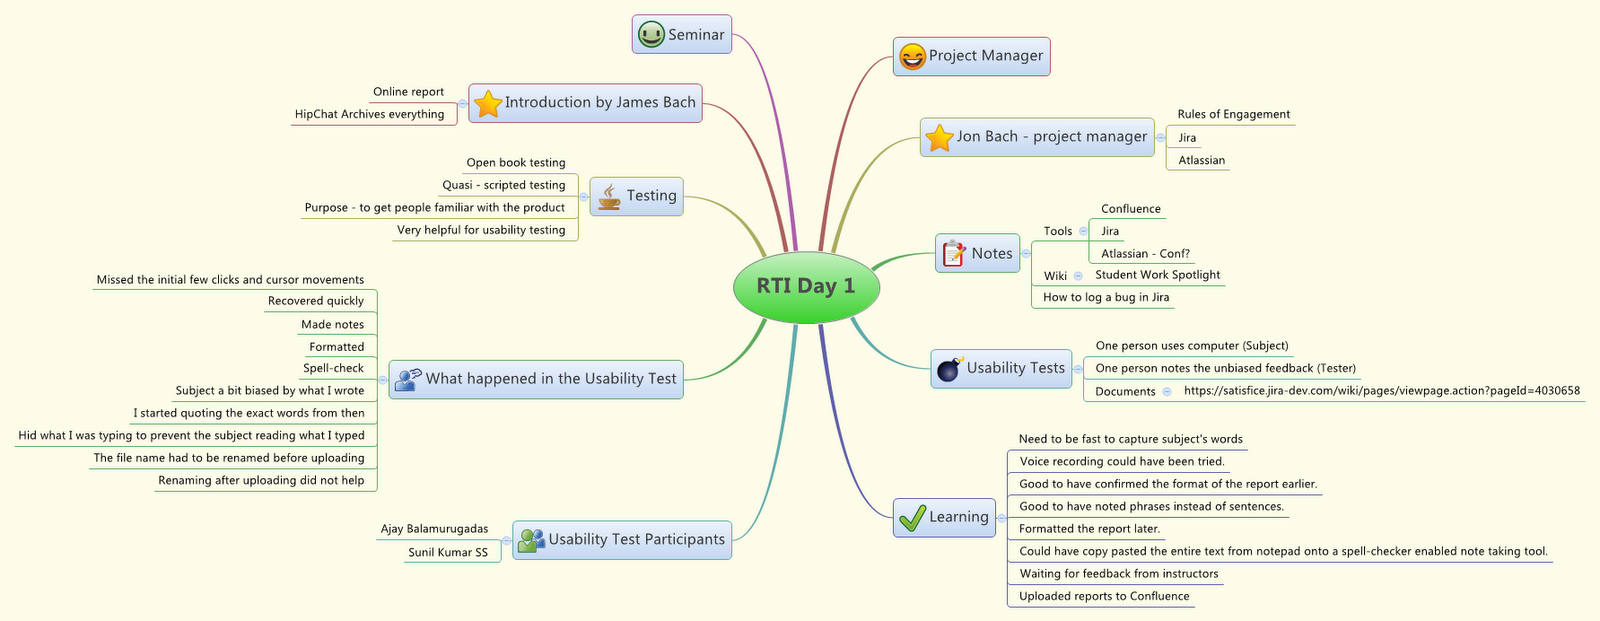 Enjoy testing: RTI 2012 - Day 1 - Usability Testing